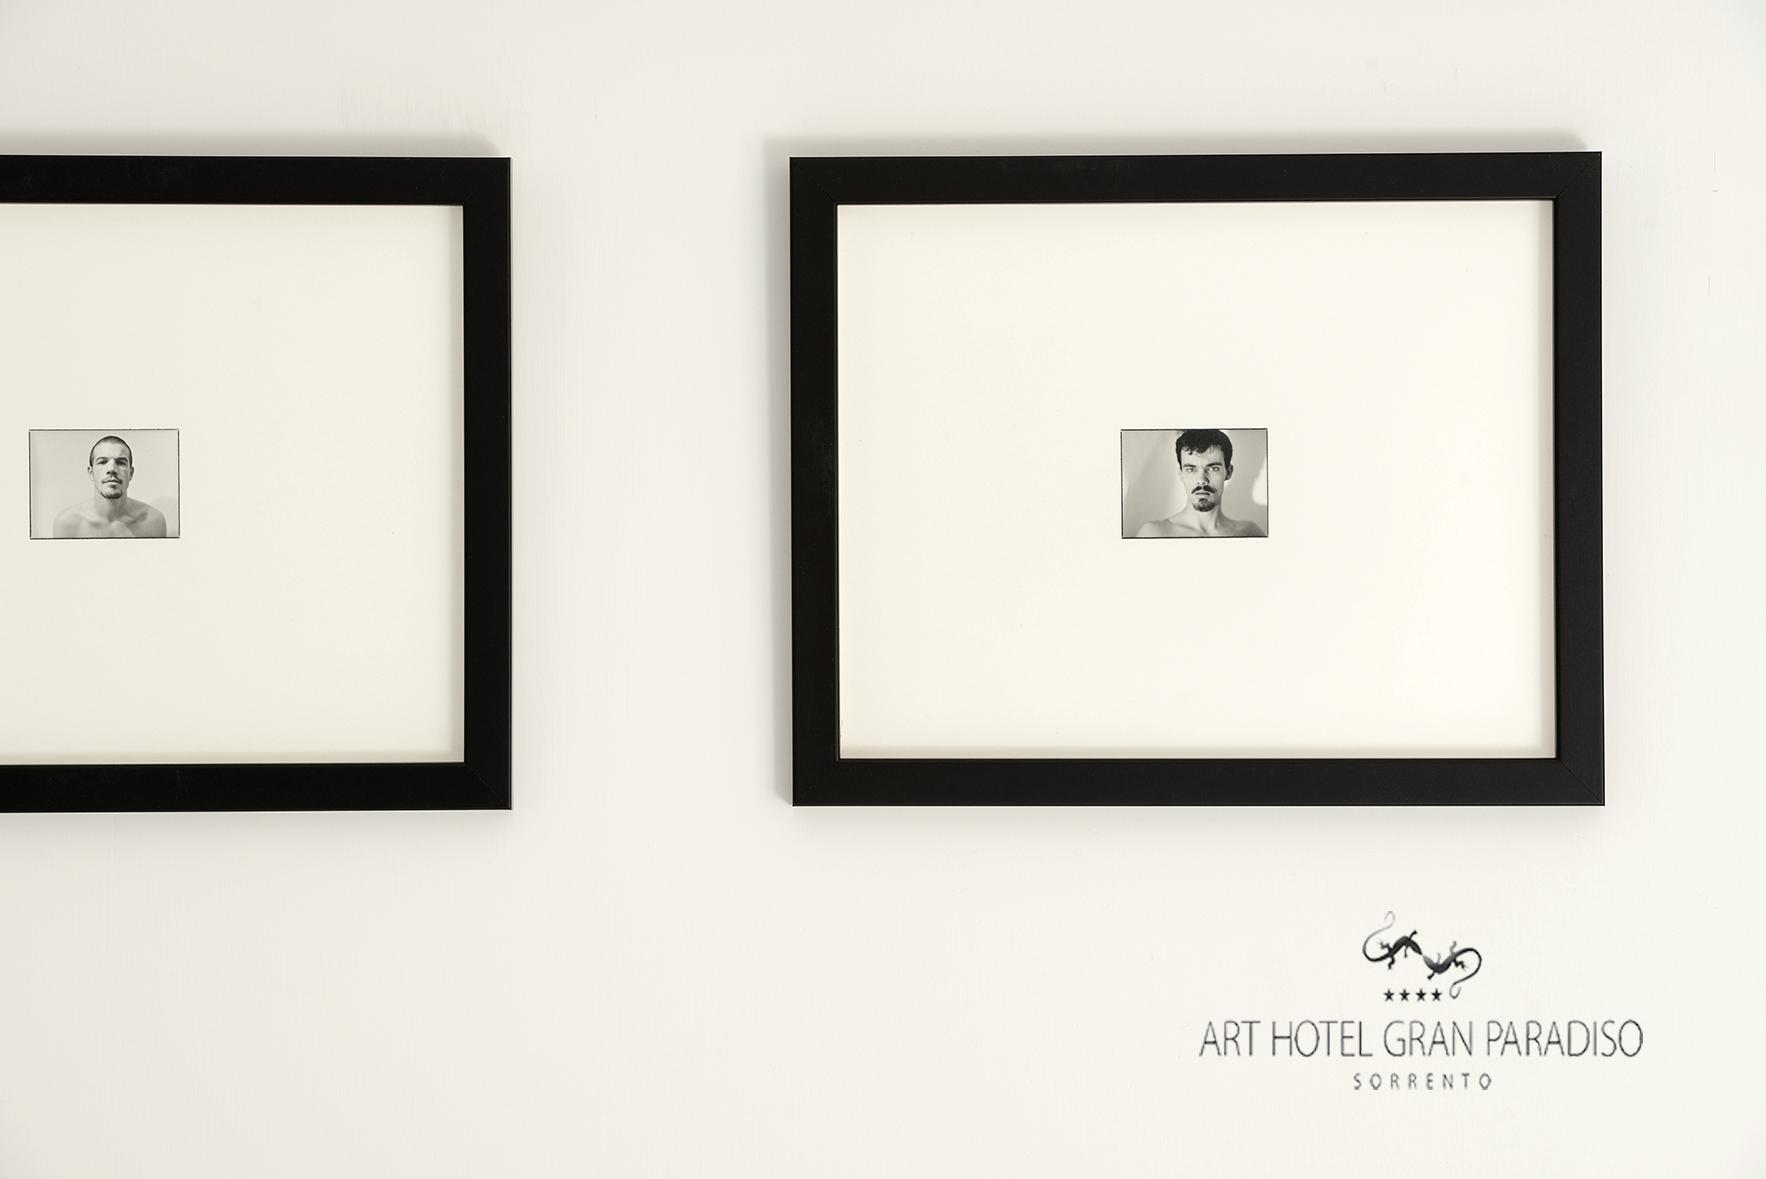 Art_Hotel_Gran_Paradiso_2013_412_Luca_Massimo_Barbero_6.jpg